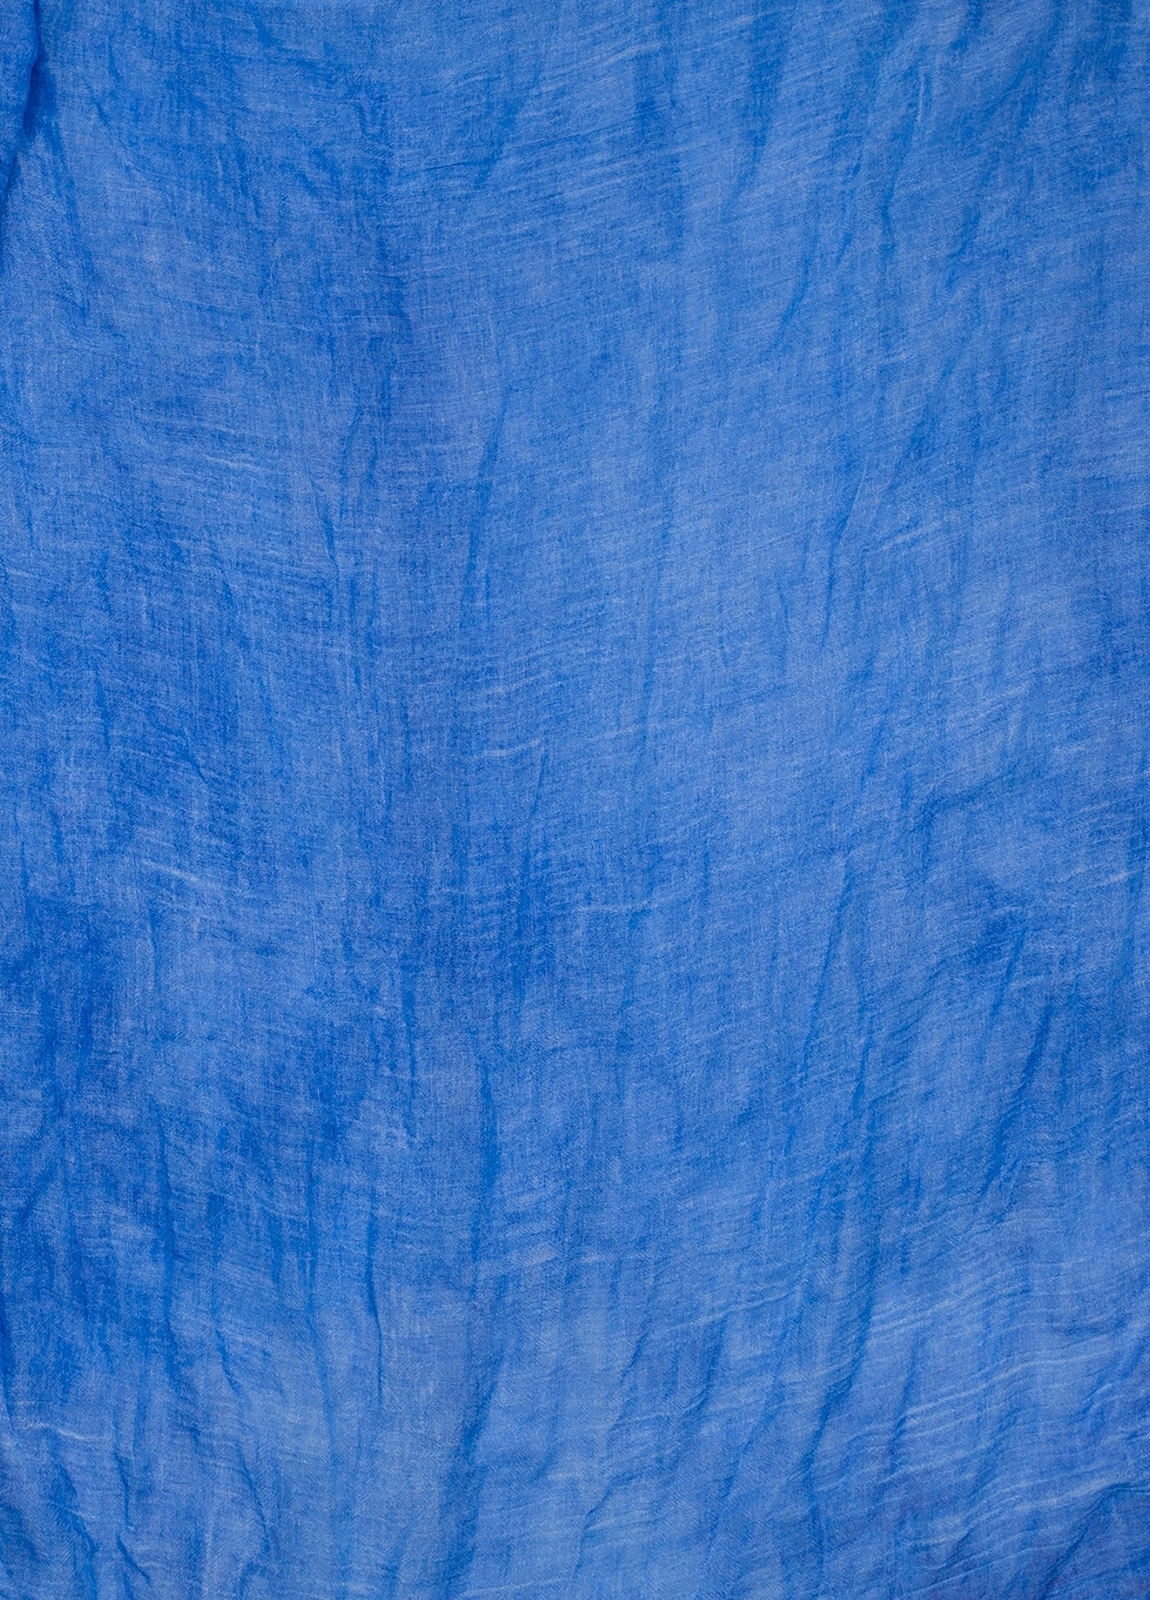 Foulard ALTEA azul - Ítem1